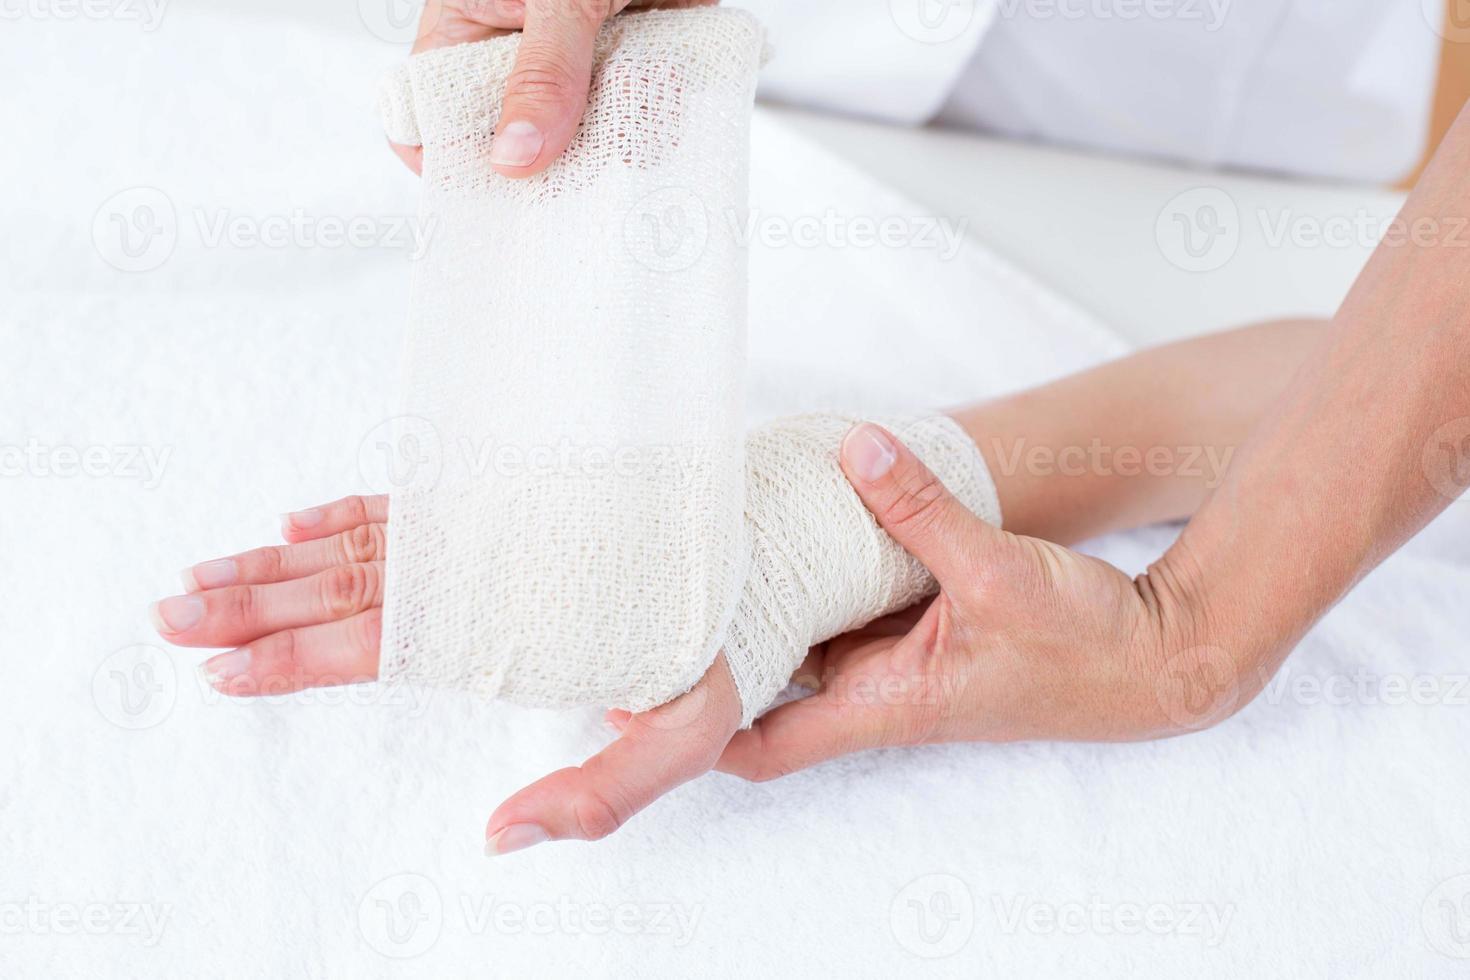 läkare bandager hennes patienthandled foto